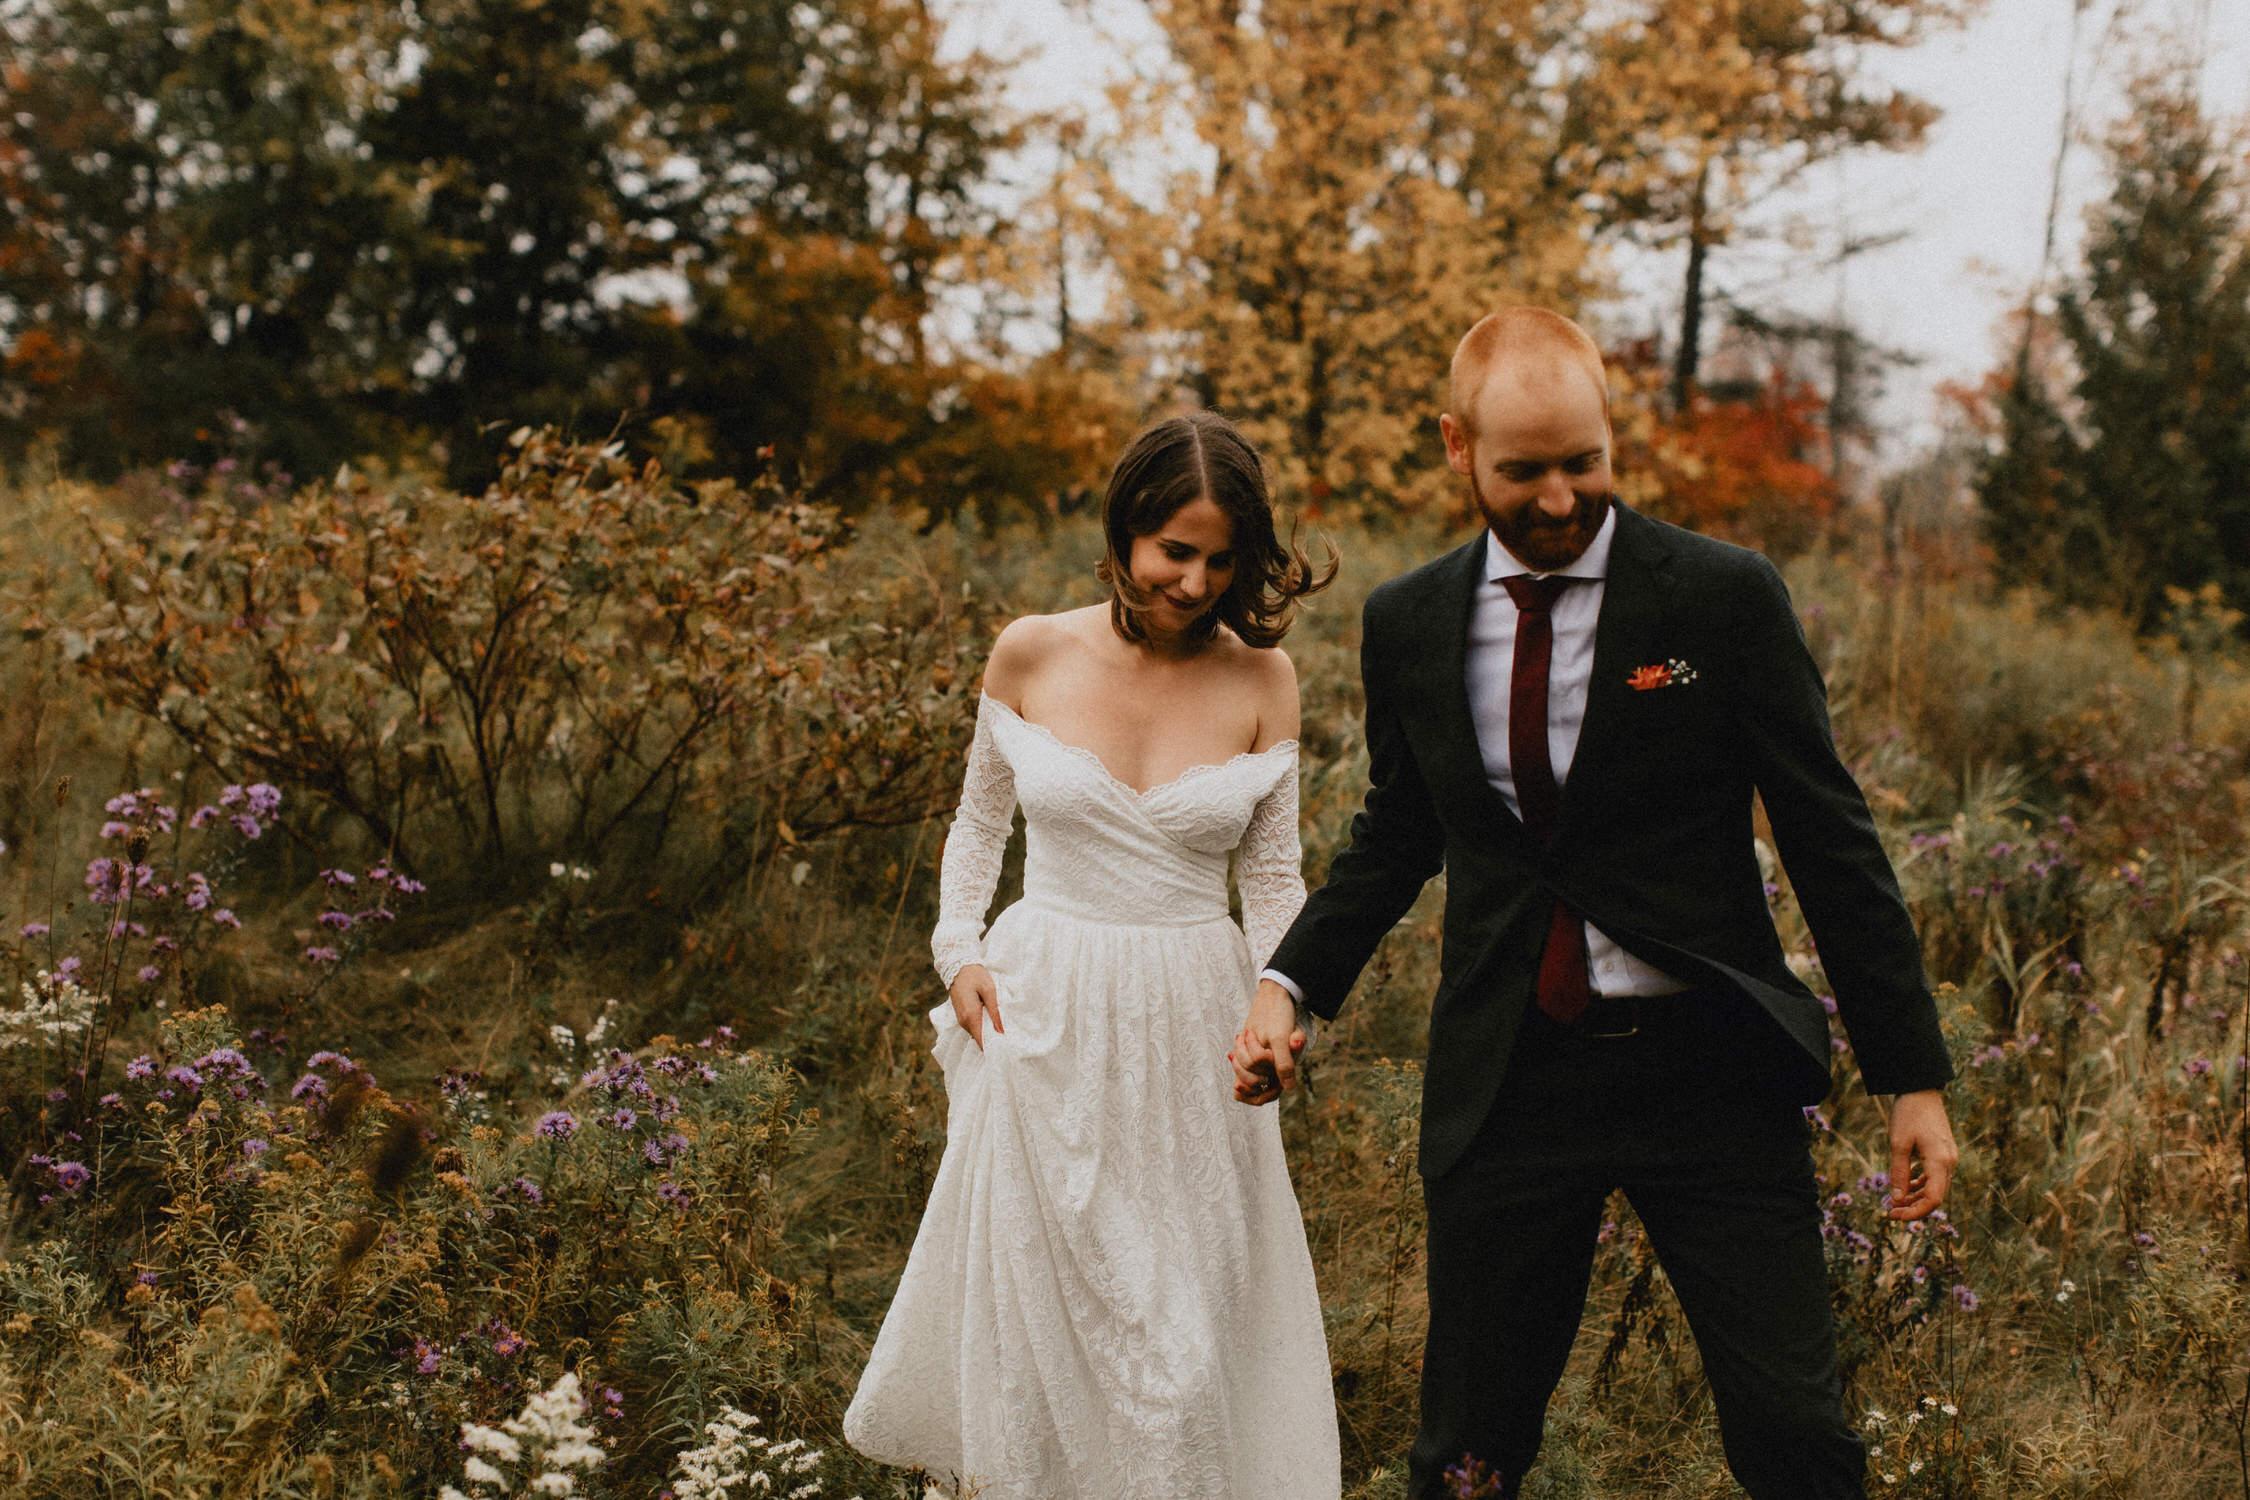 Groom leads bride through wildflower field - Huron Natural Area Micro Wedding Kitchener, Ontario